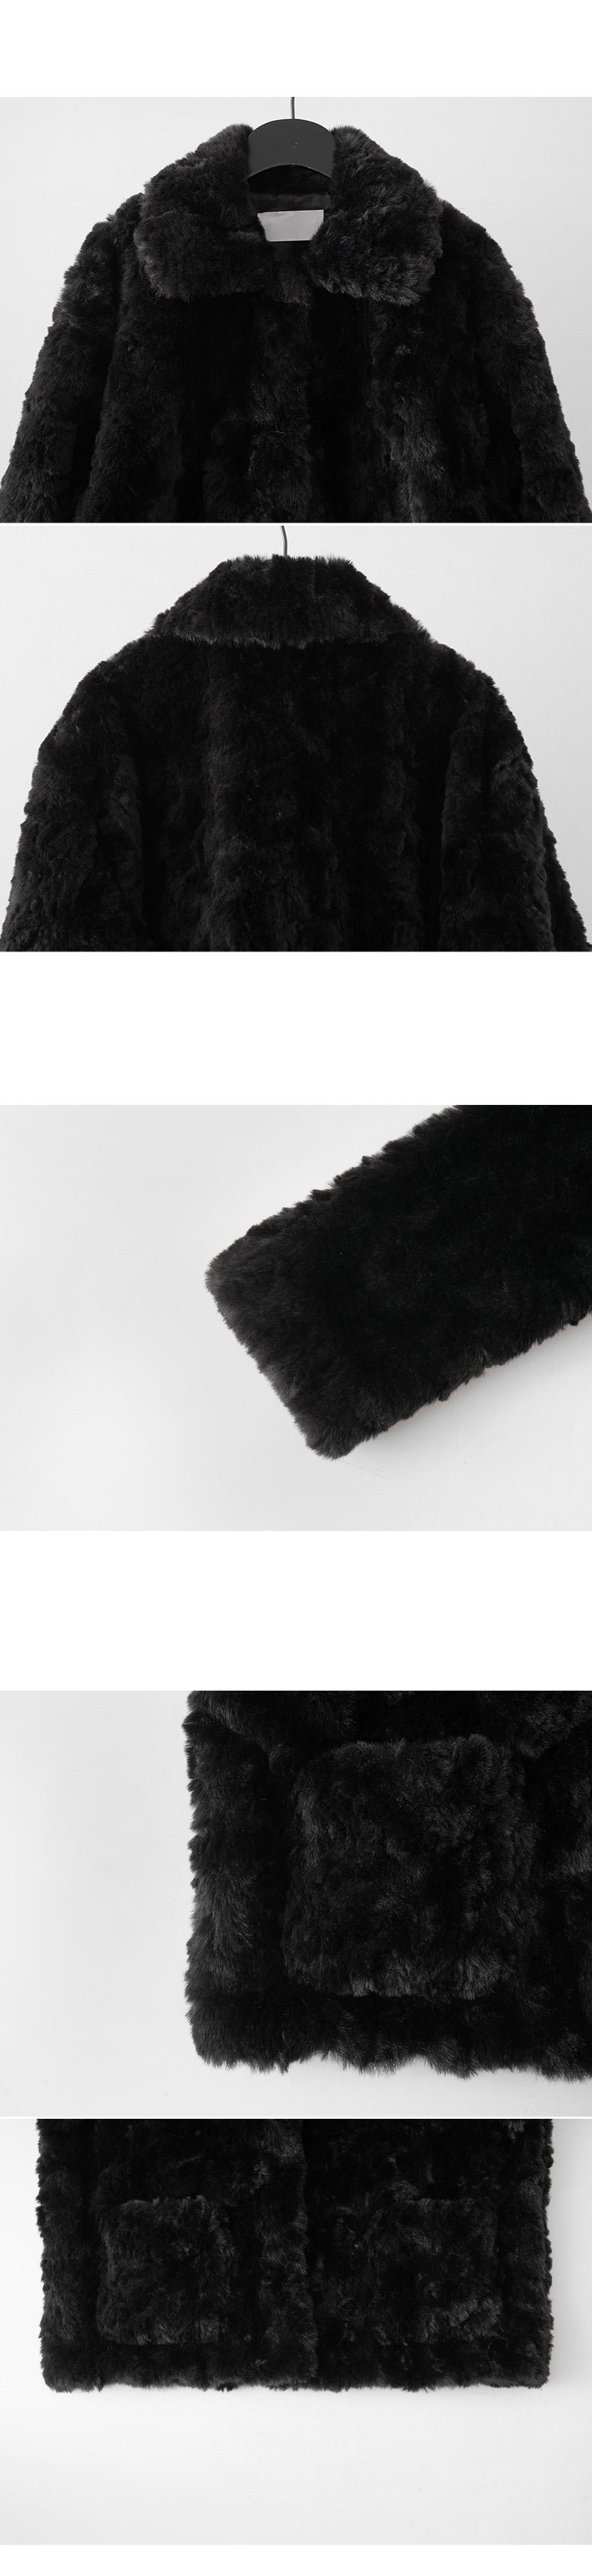 clean soft fake fur jacket (3colors)